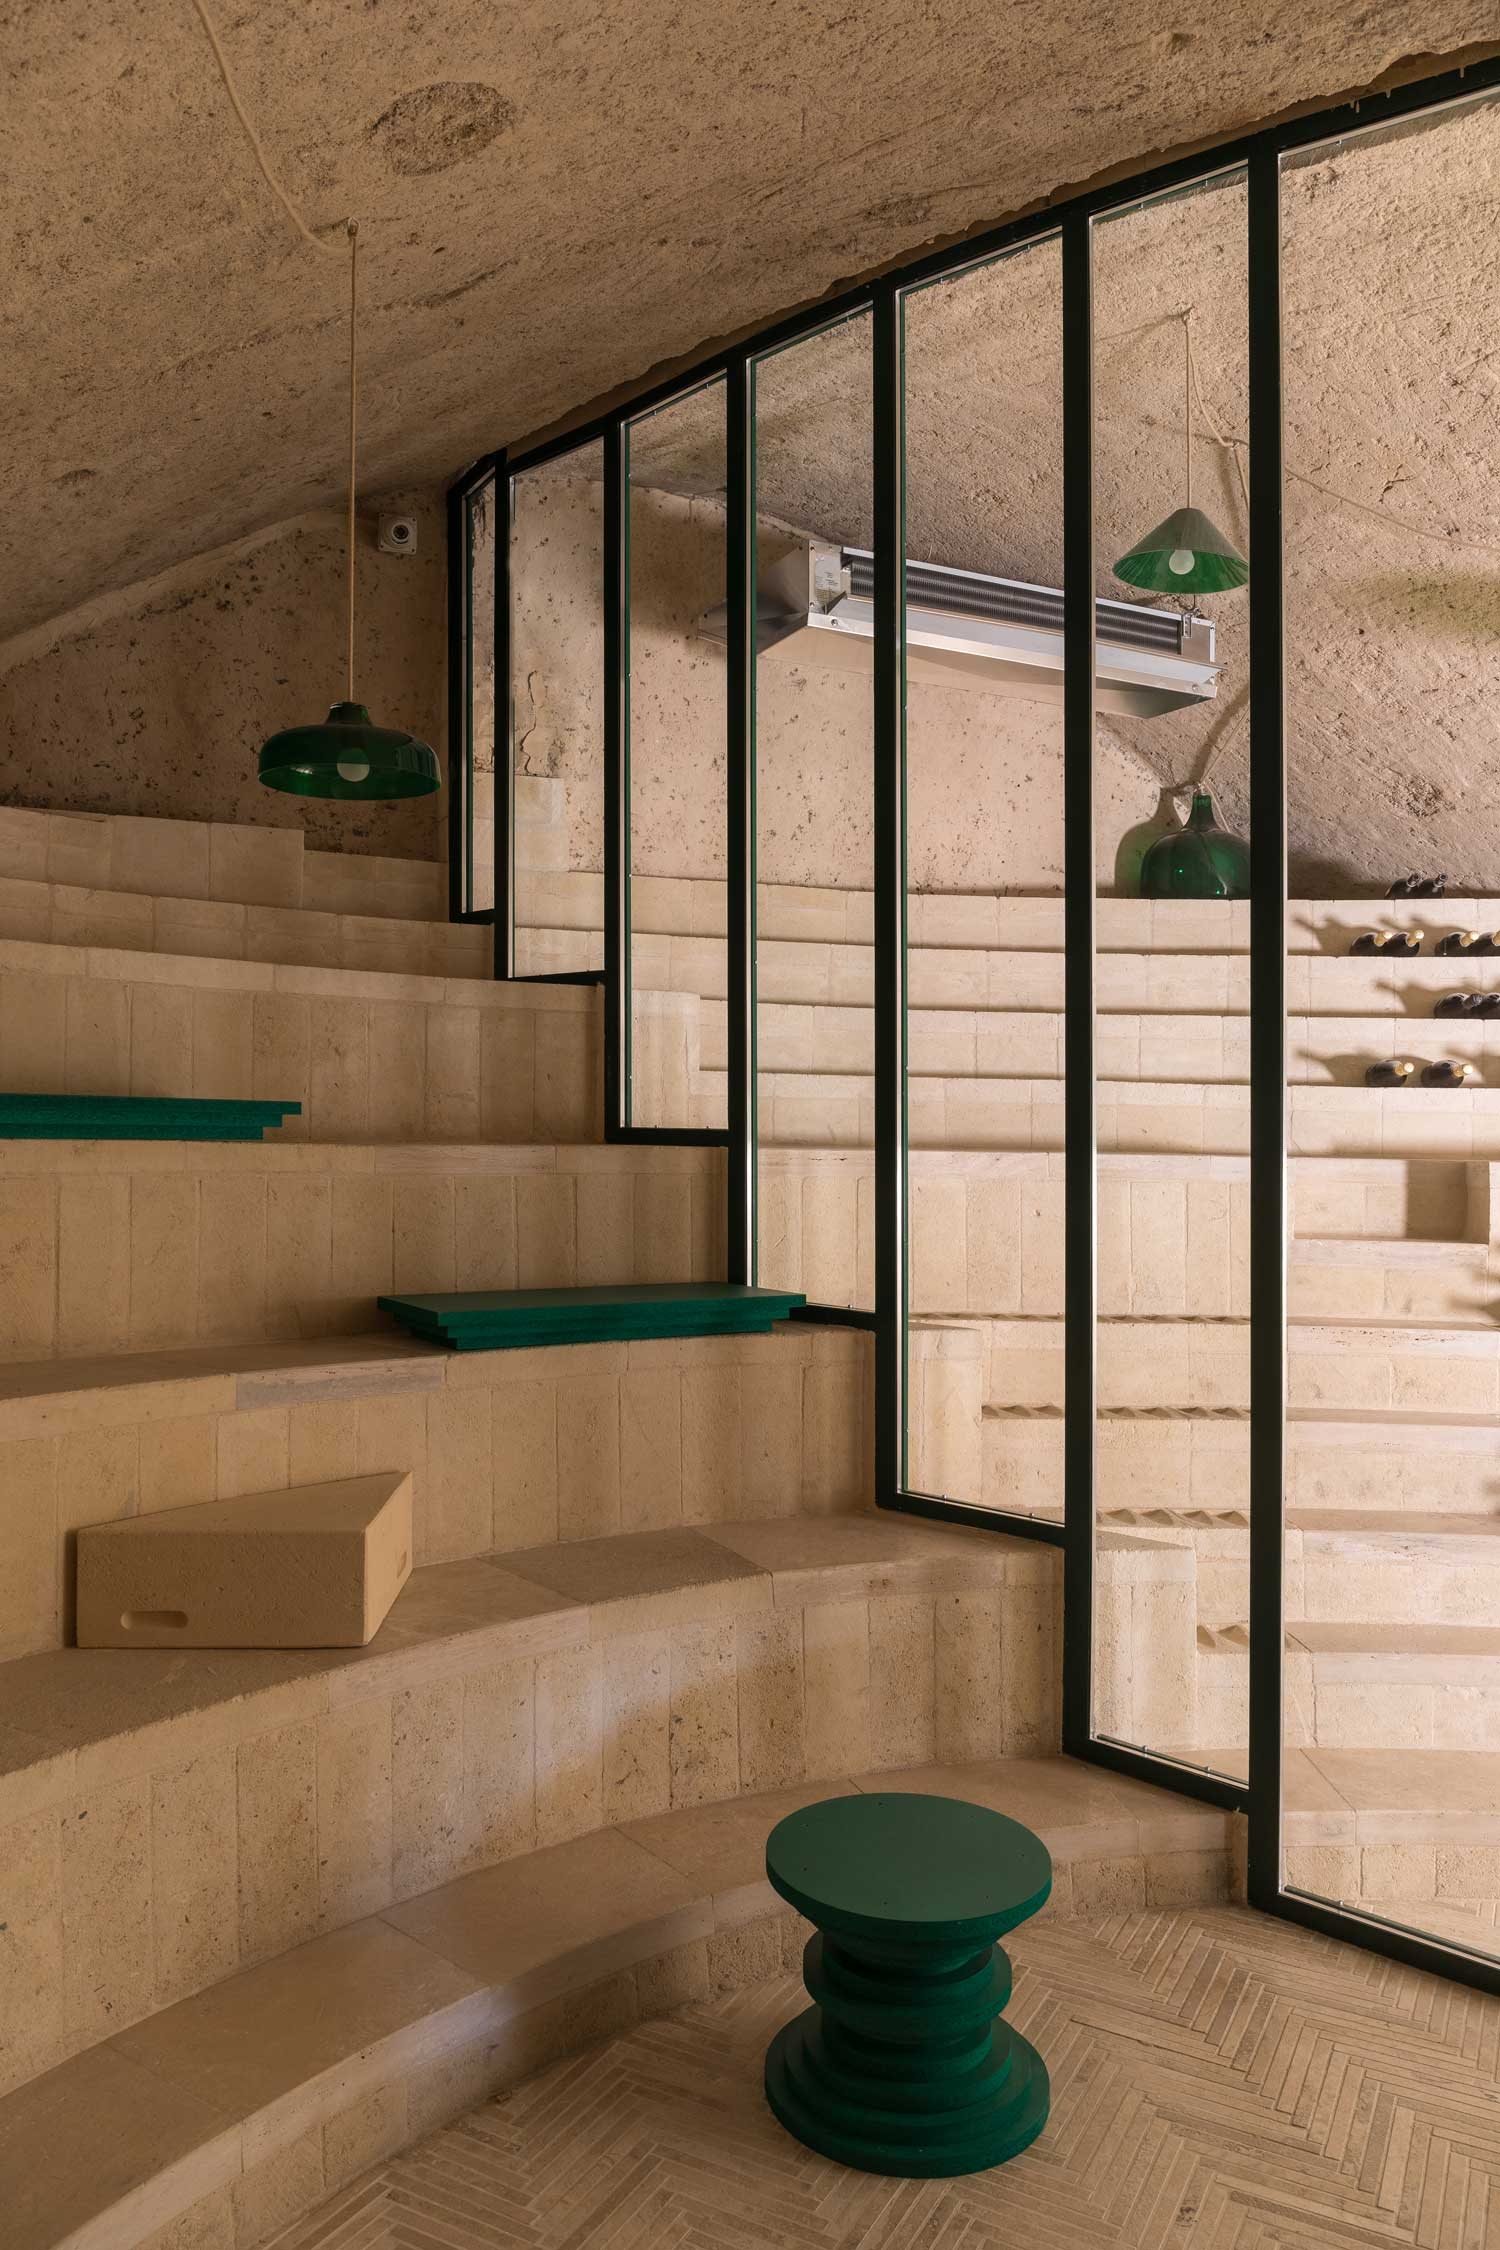 Enoteca-dai-Tosi-Wine-Bar-in-Matera-Italy-by-Architecten-De-Vylder-Vinck-Taillieu-cafeveyafe (16)